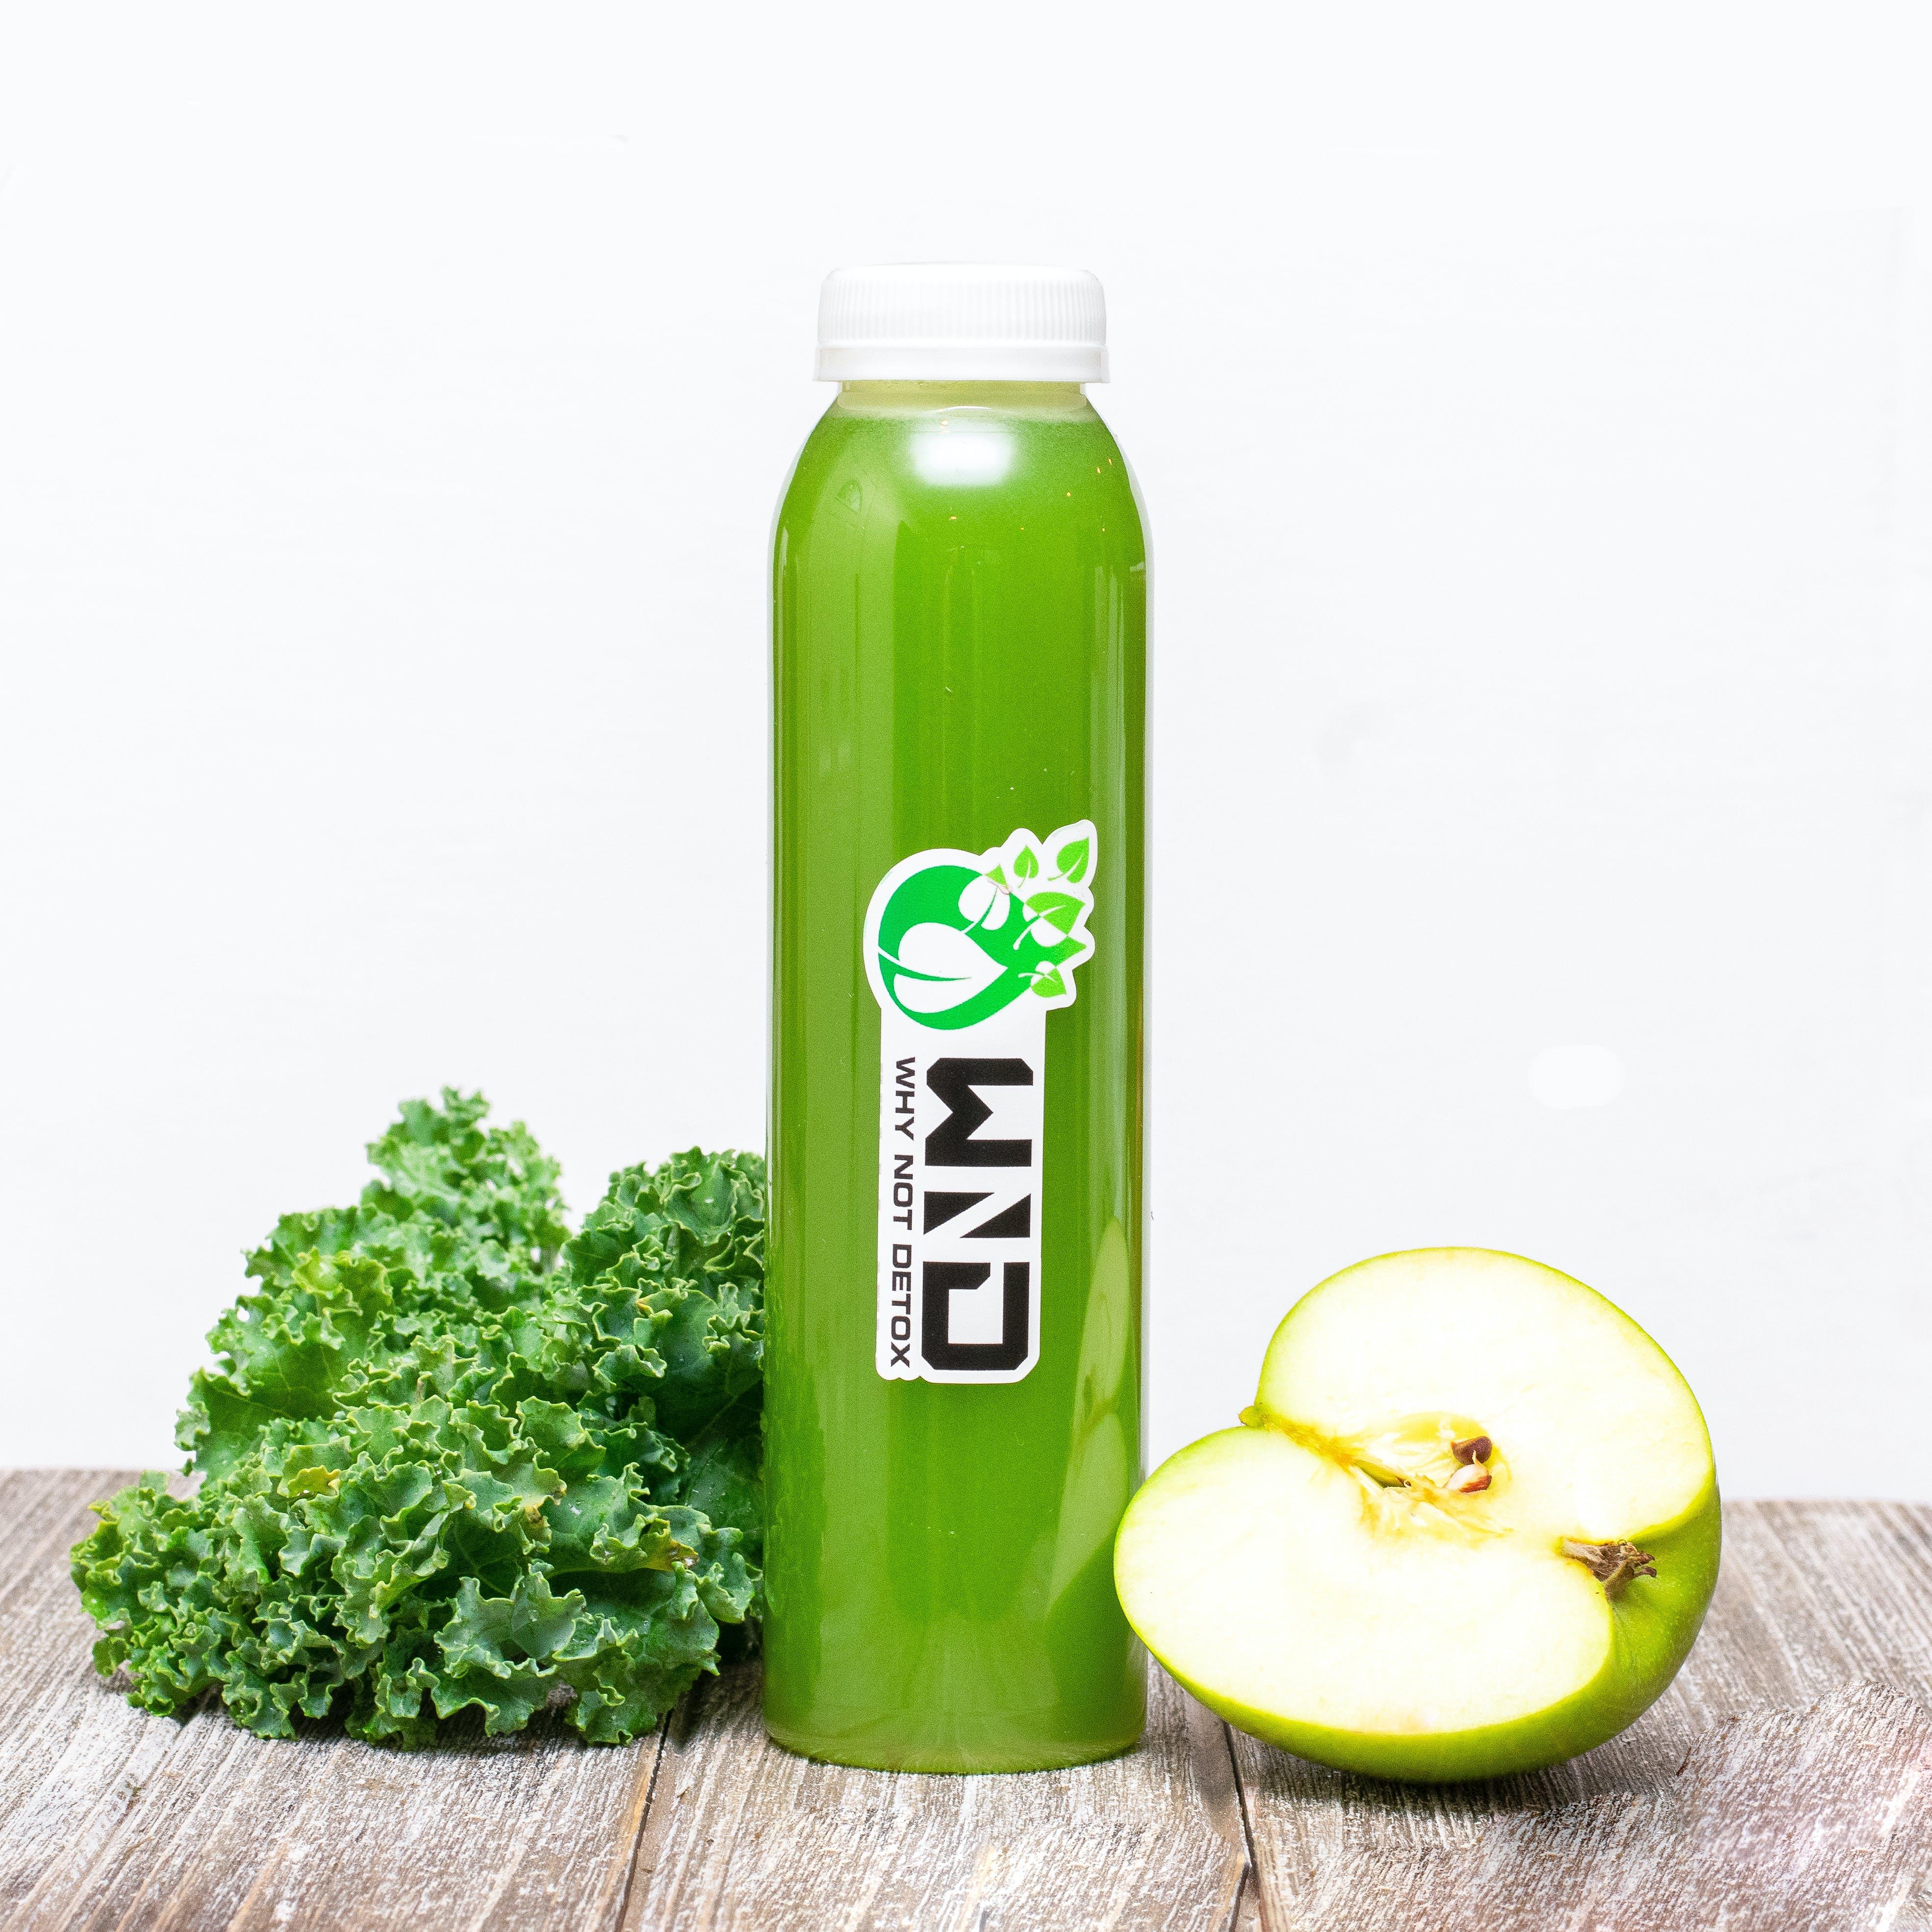 Green Plastic Bottle Beside Green Apple